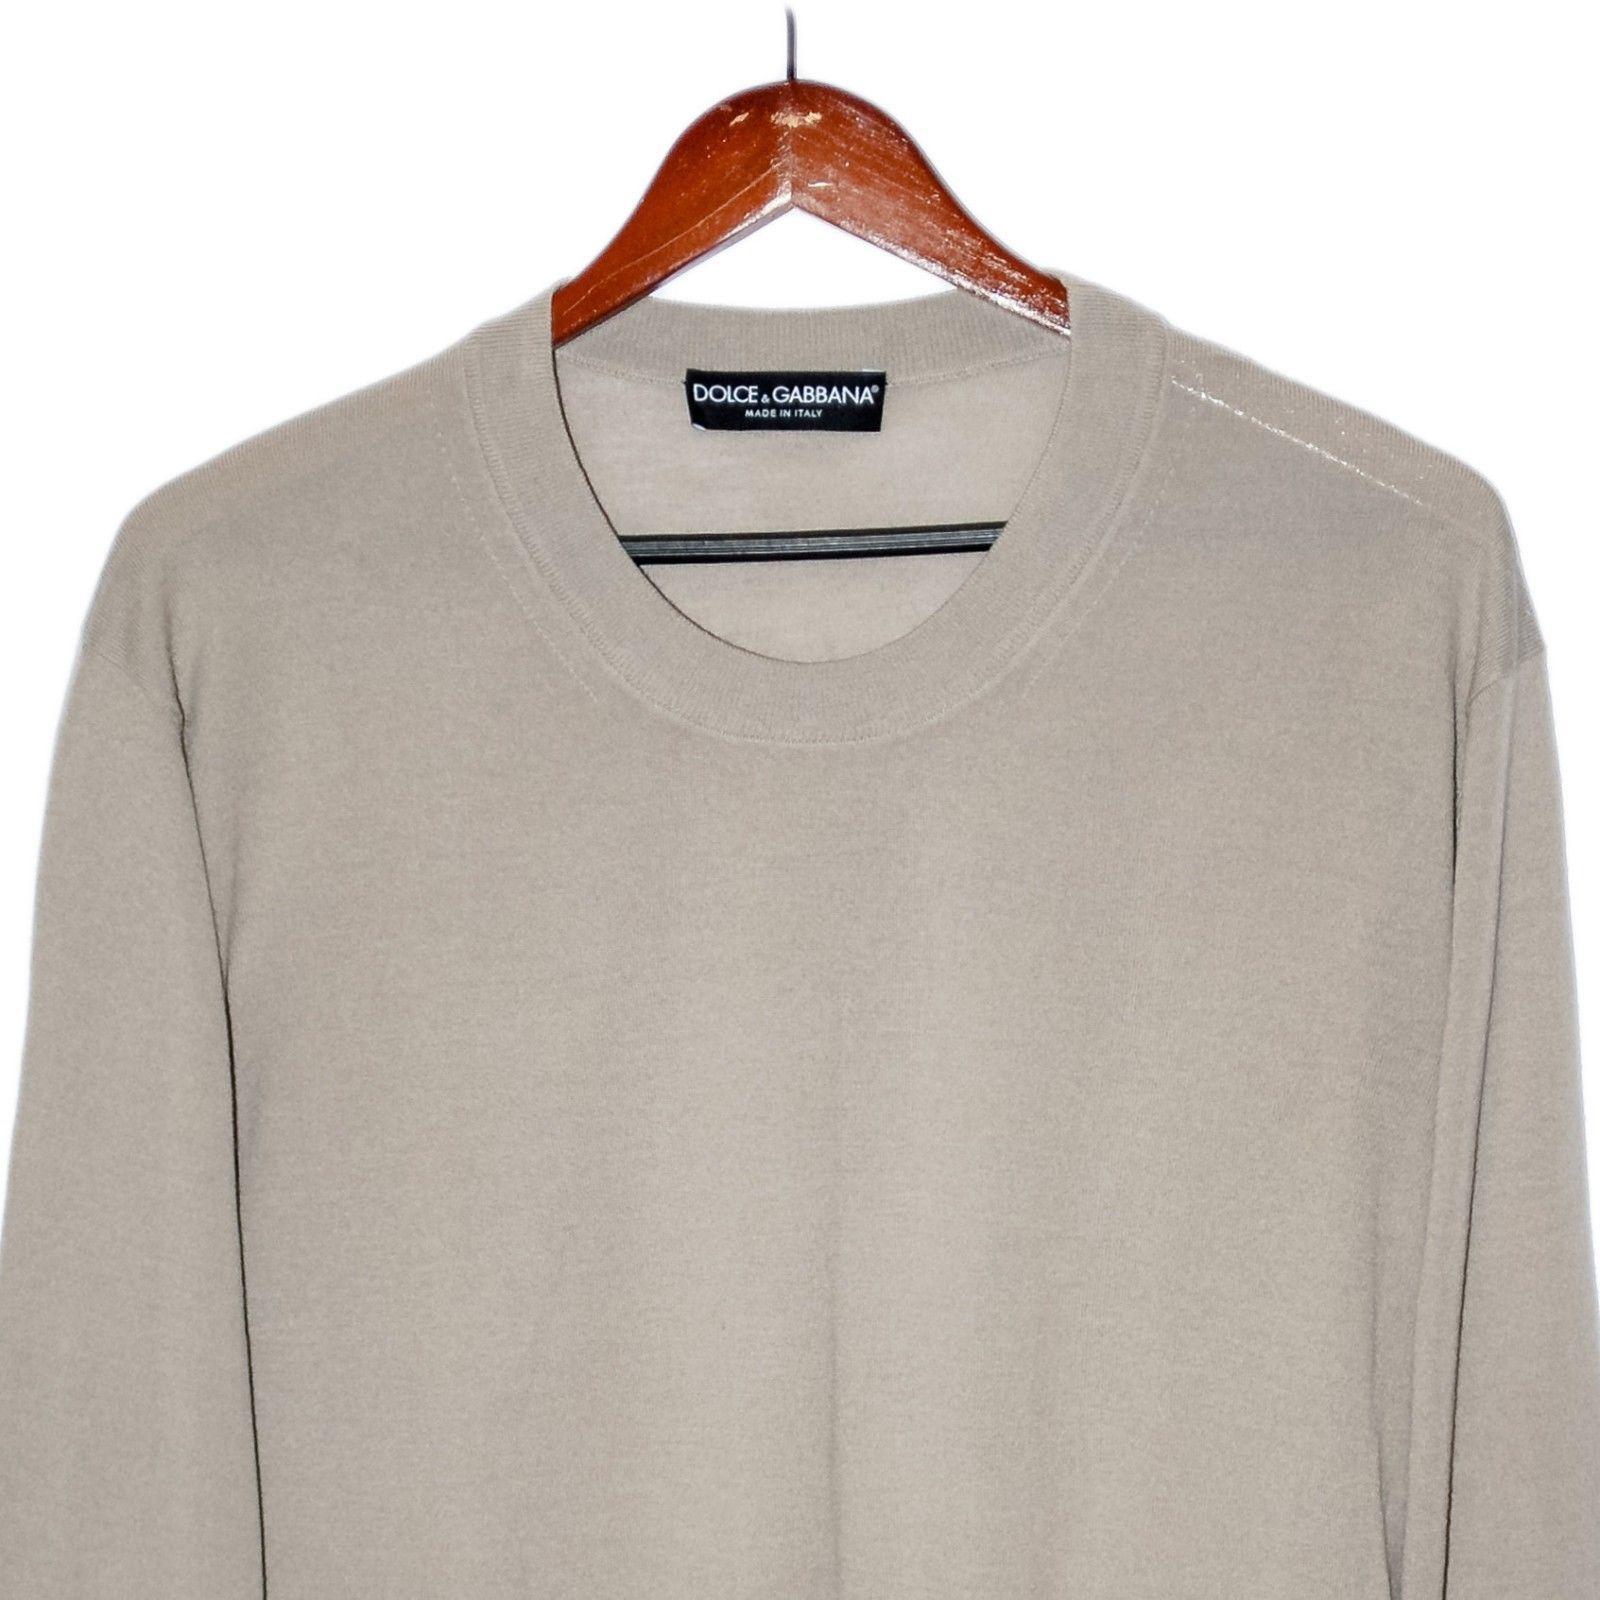 Dolce & Gabbana Beige Wool Jumper Crewneck Sweatshirt Long Sleeve Pullover 2XL